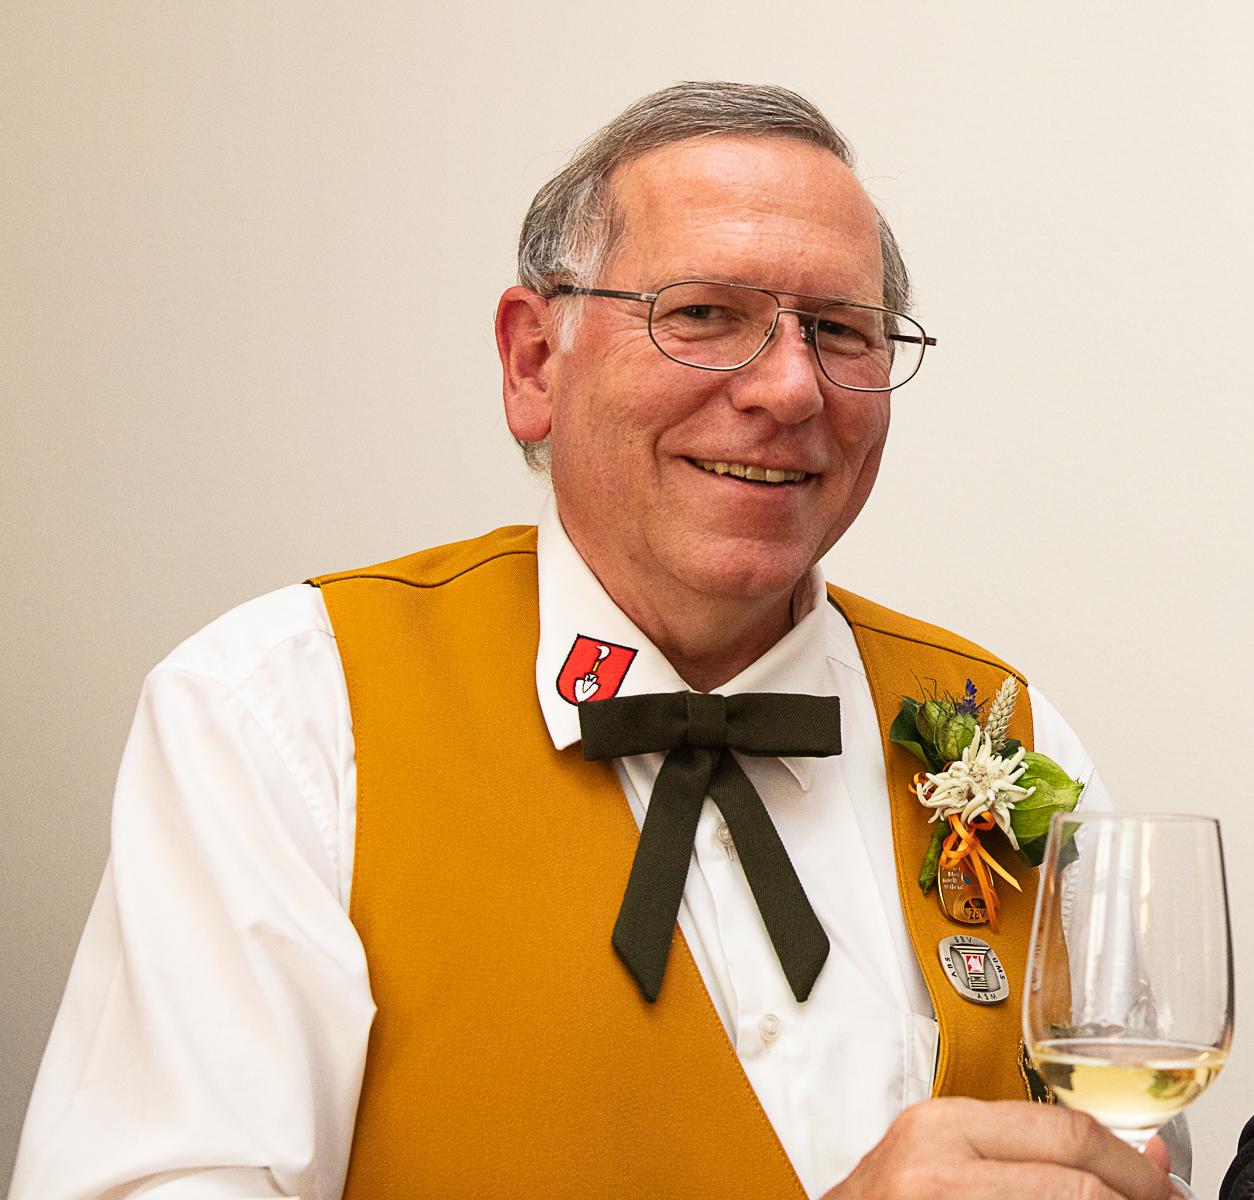 Bild Vizepräsident Kurt Bürke